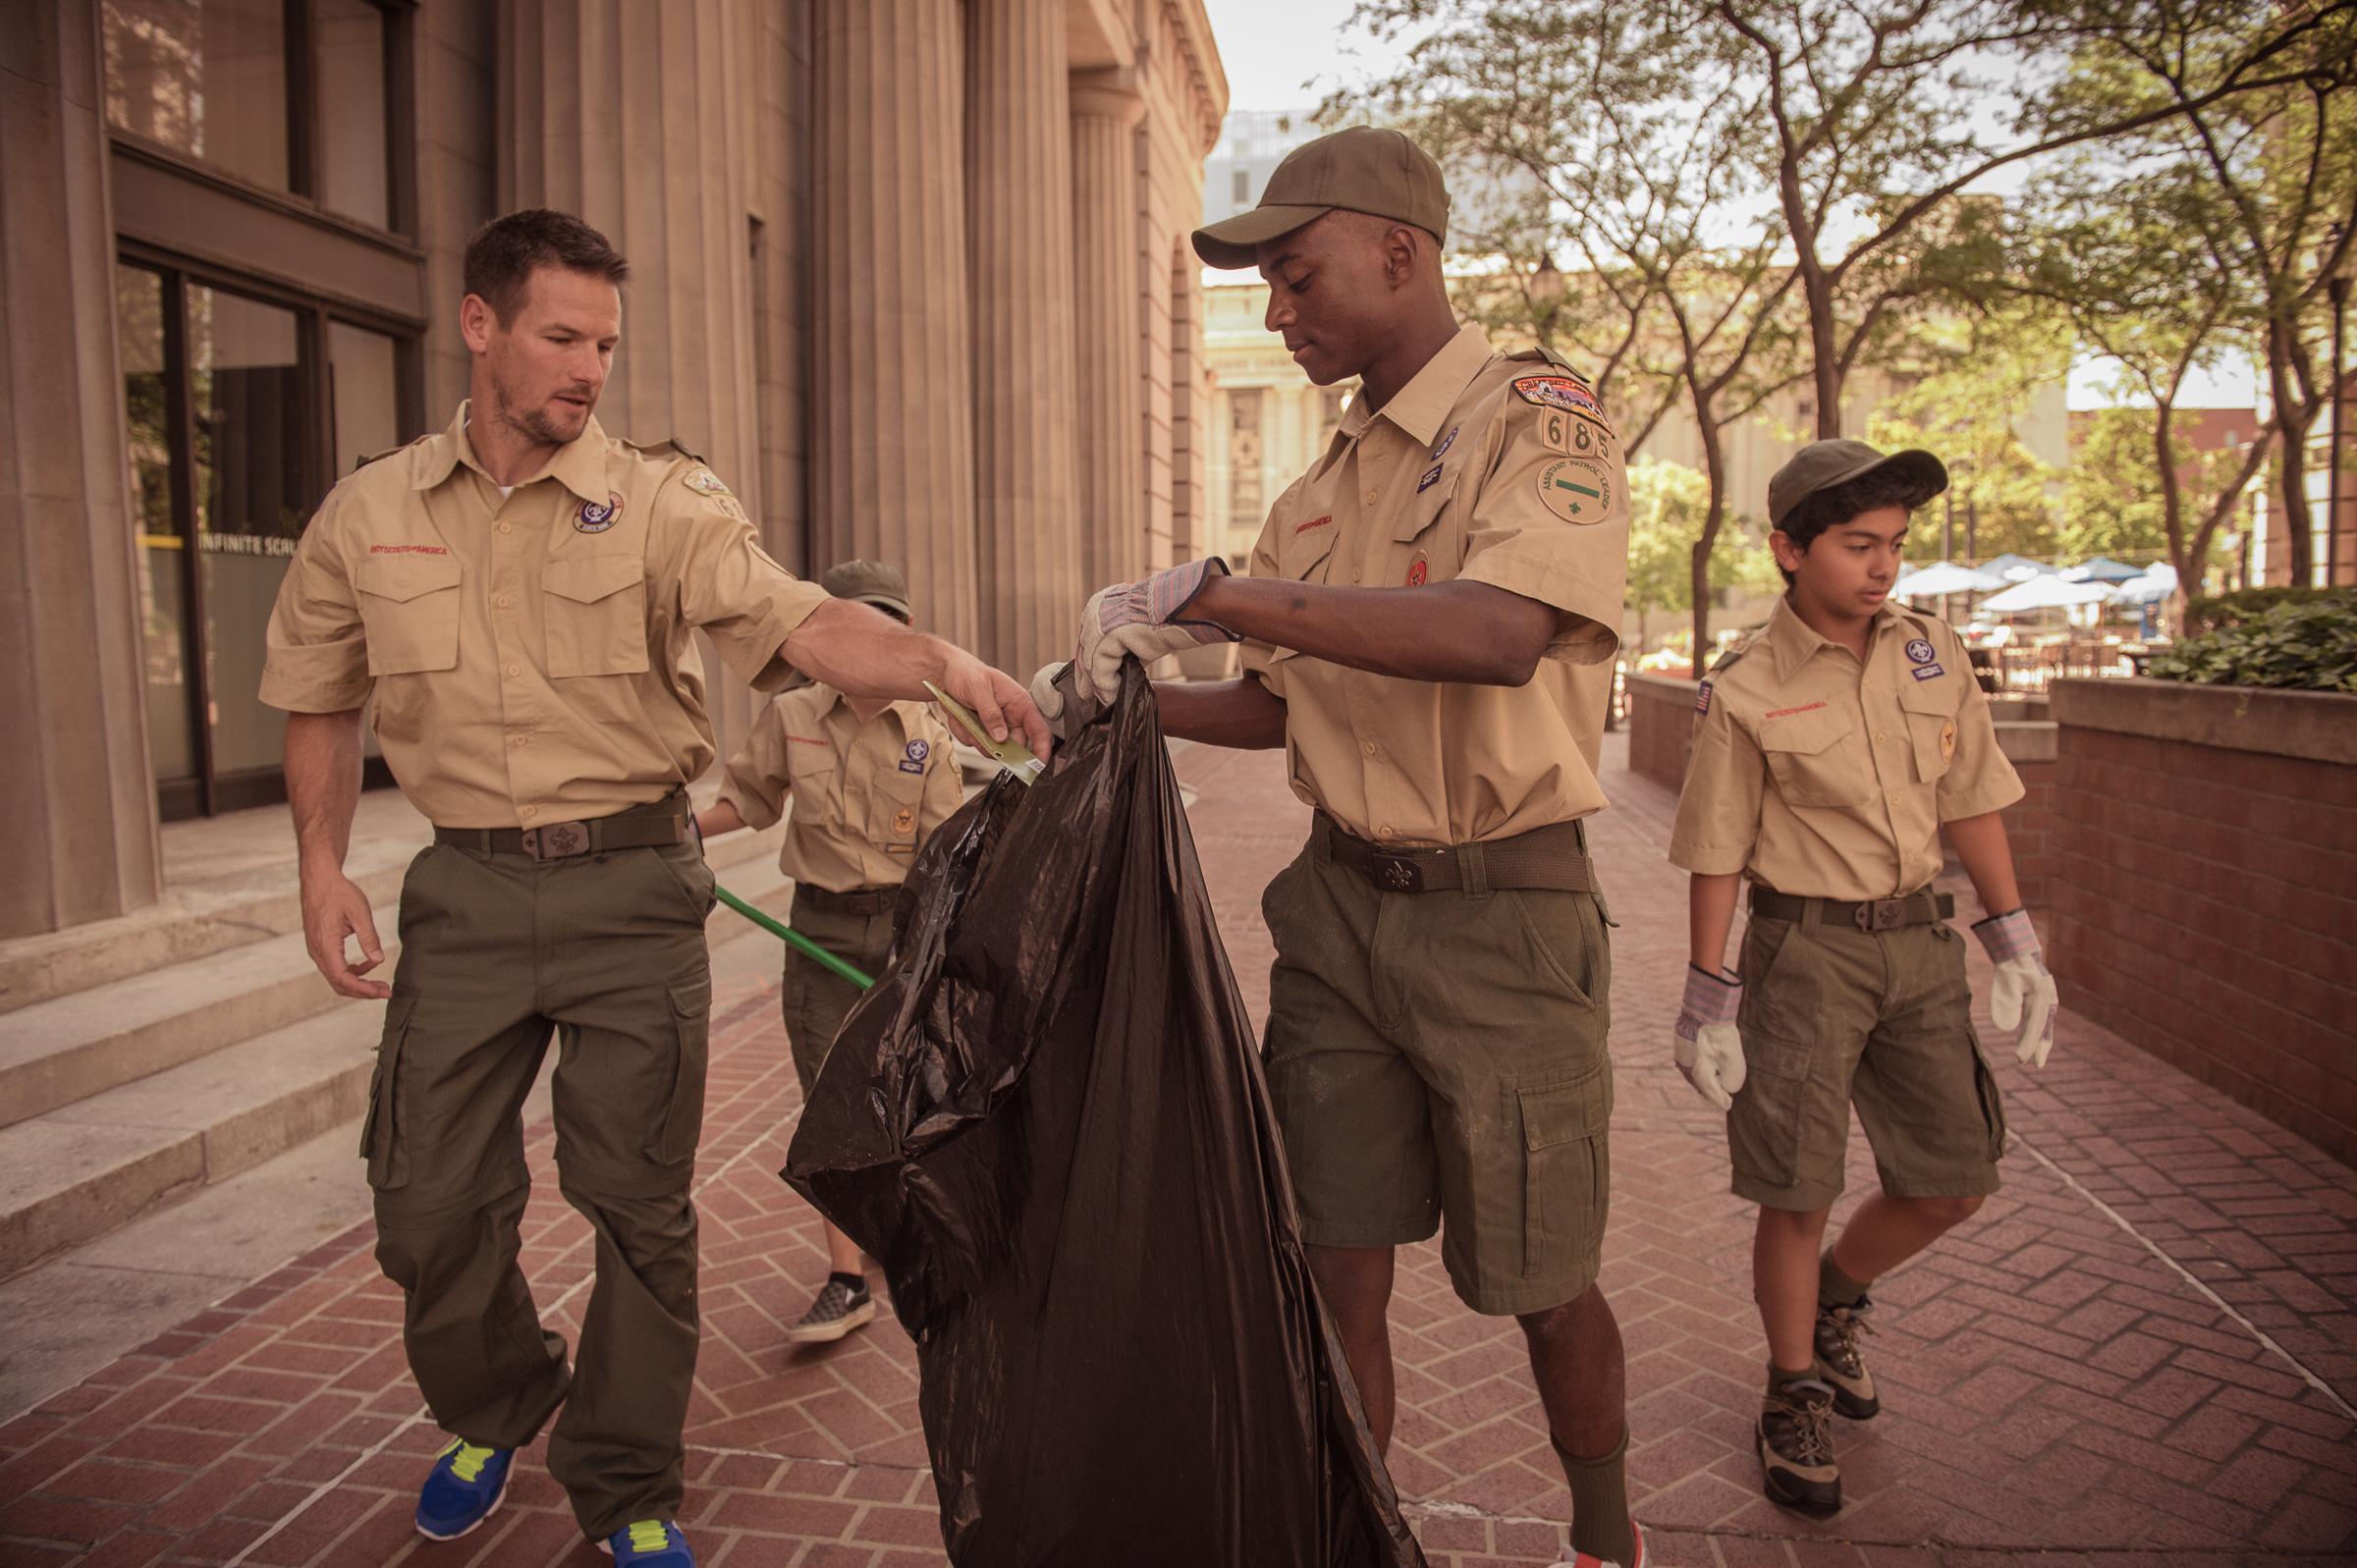 Samoset scouts bsa community service